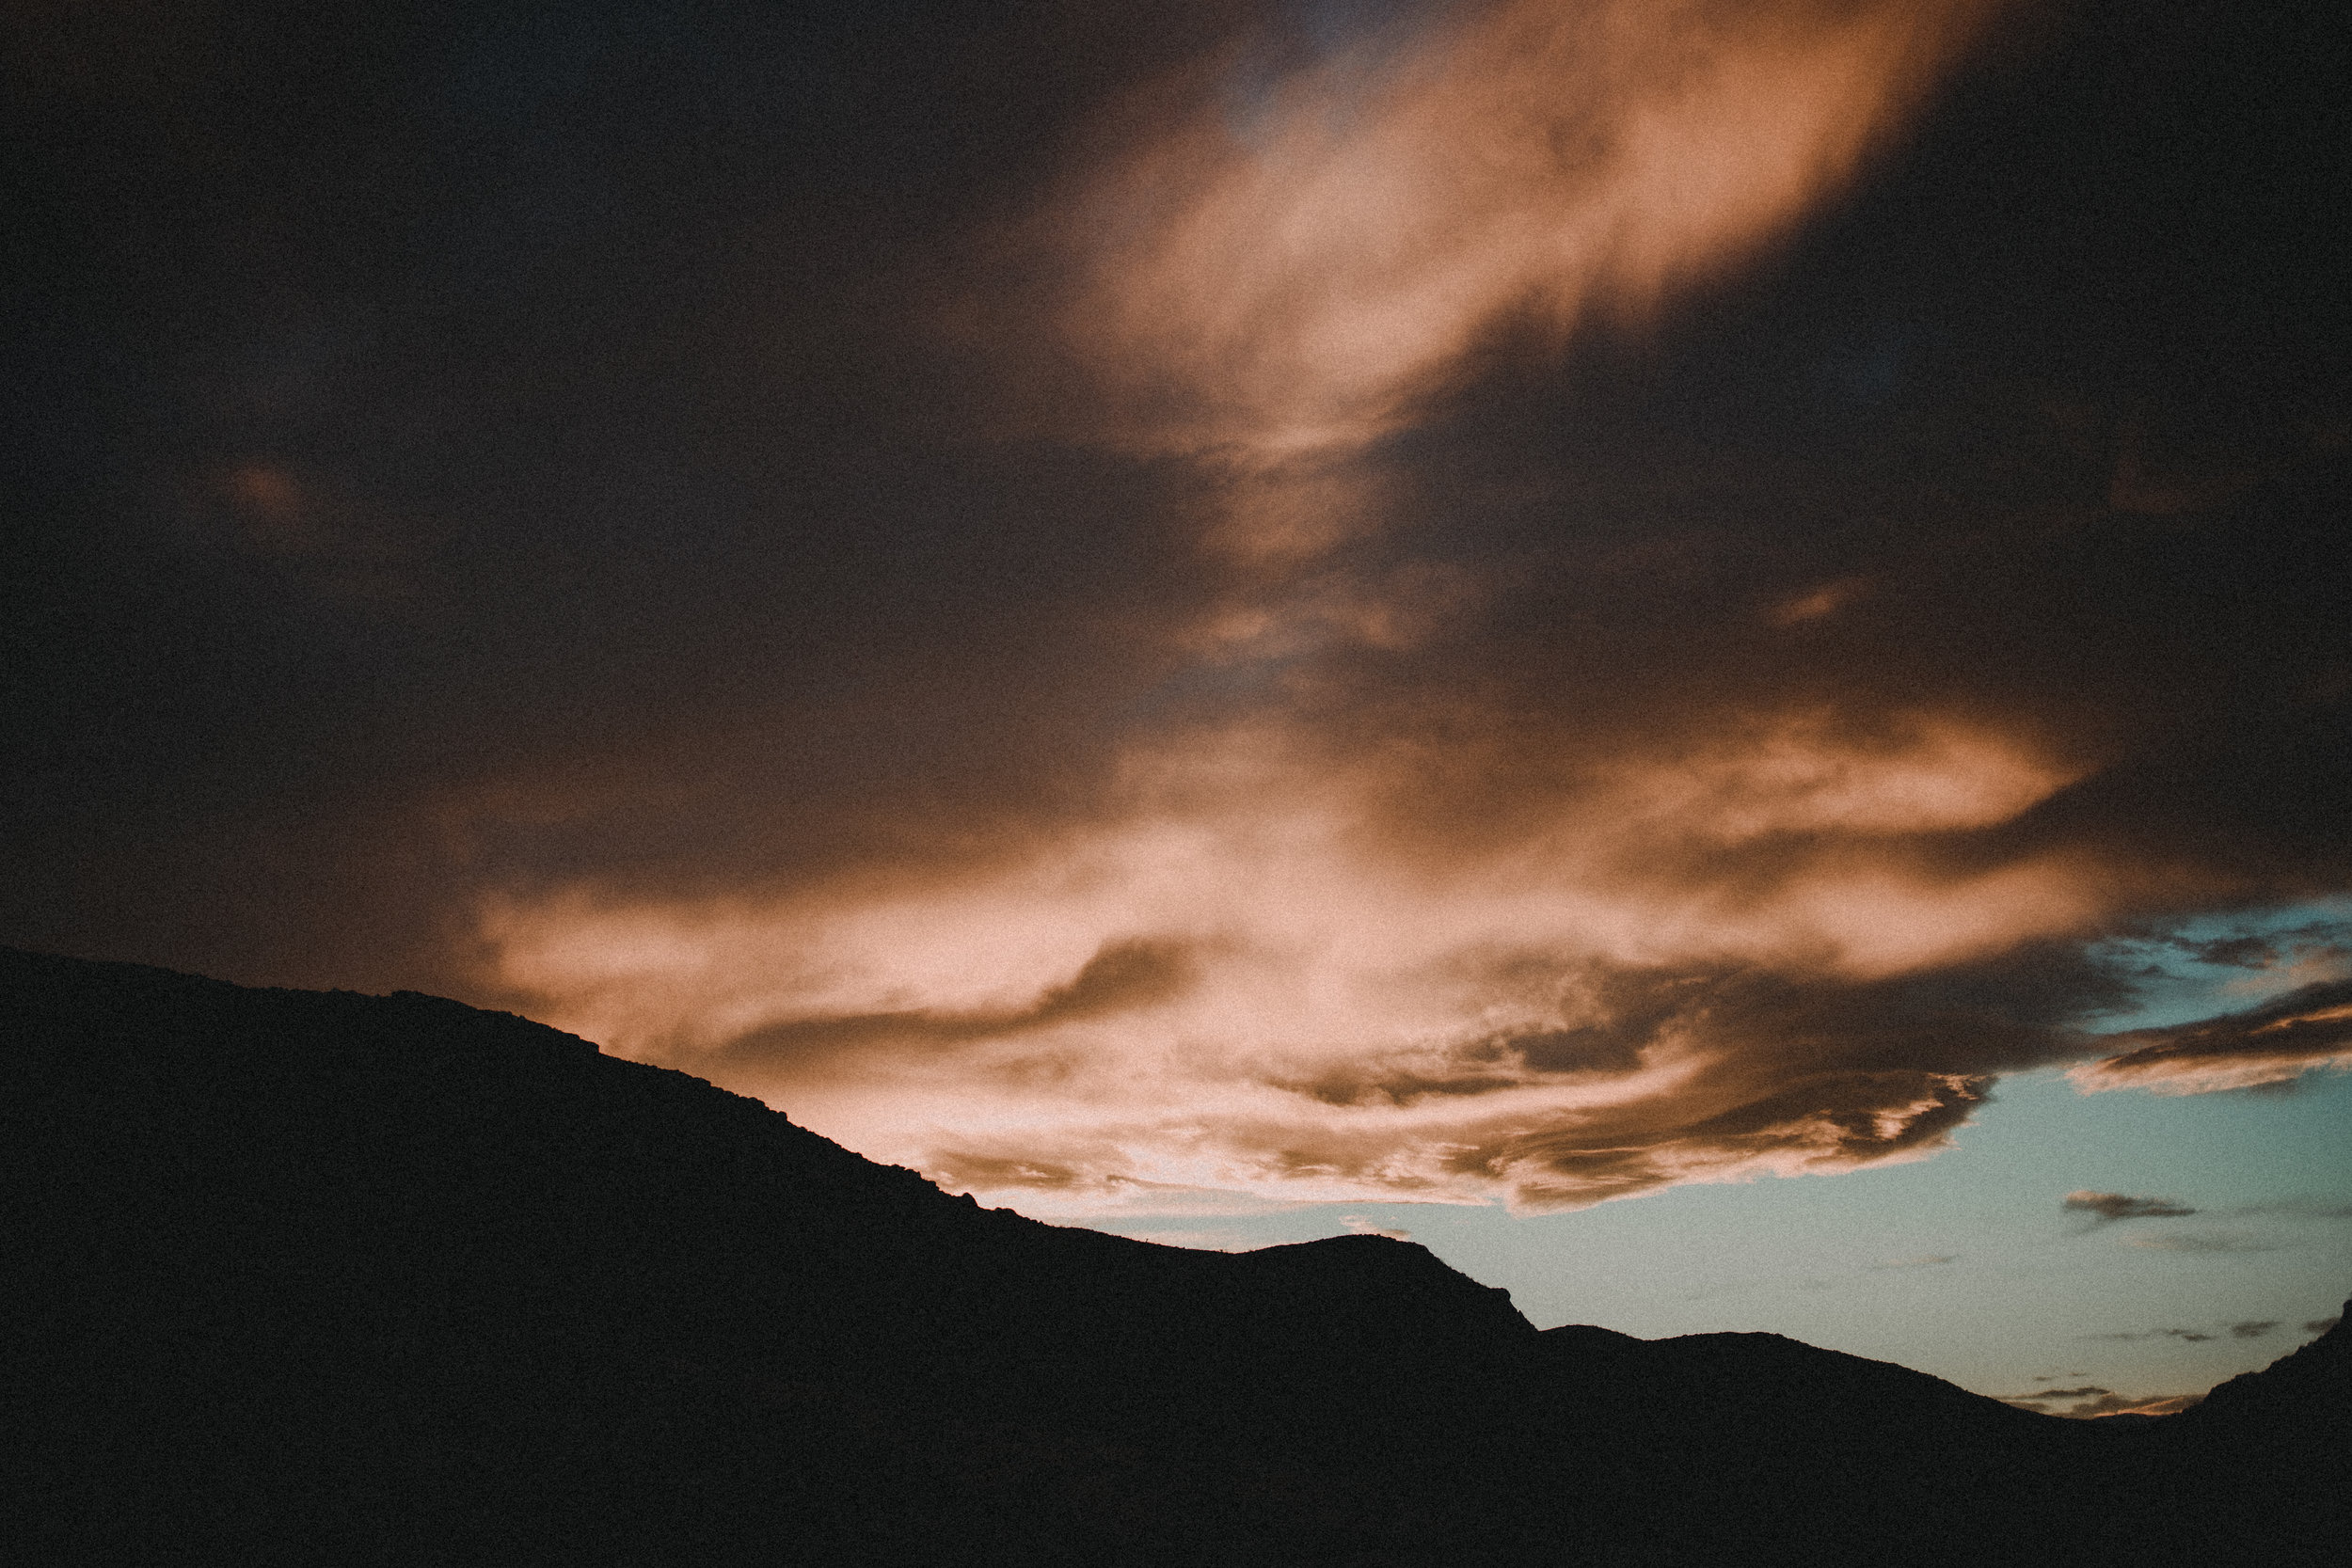 01/29/16 - JOSHUA TREE NATIONAL PARK, CALIFORNIA, U.S.A.